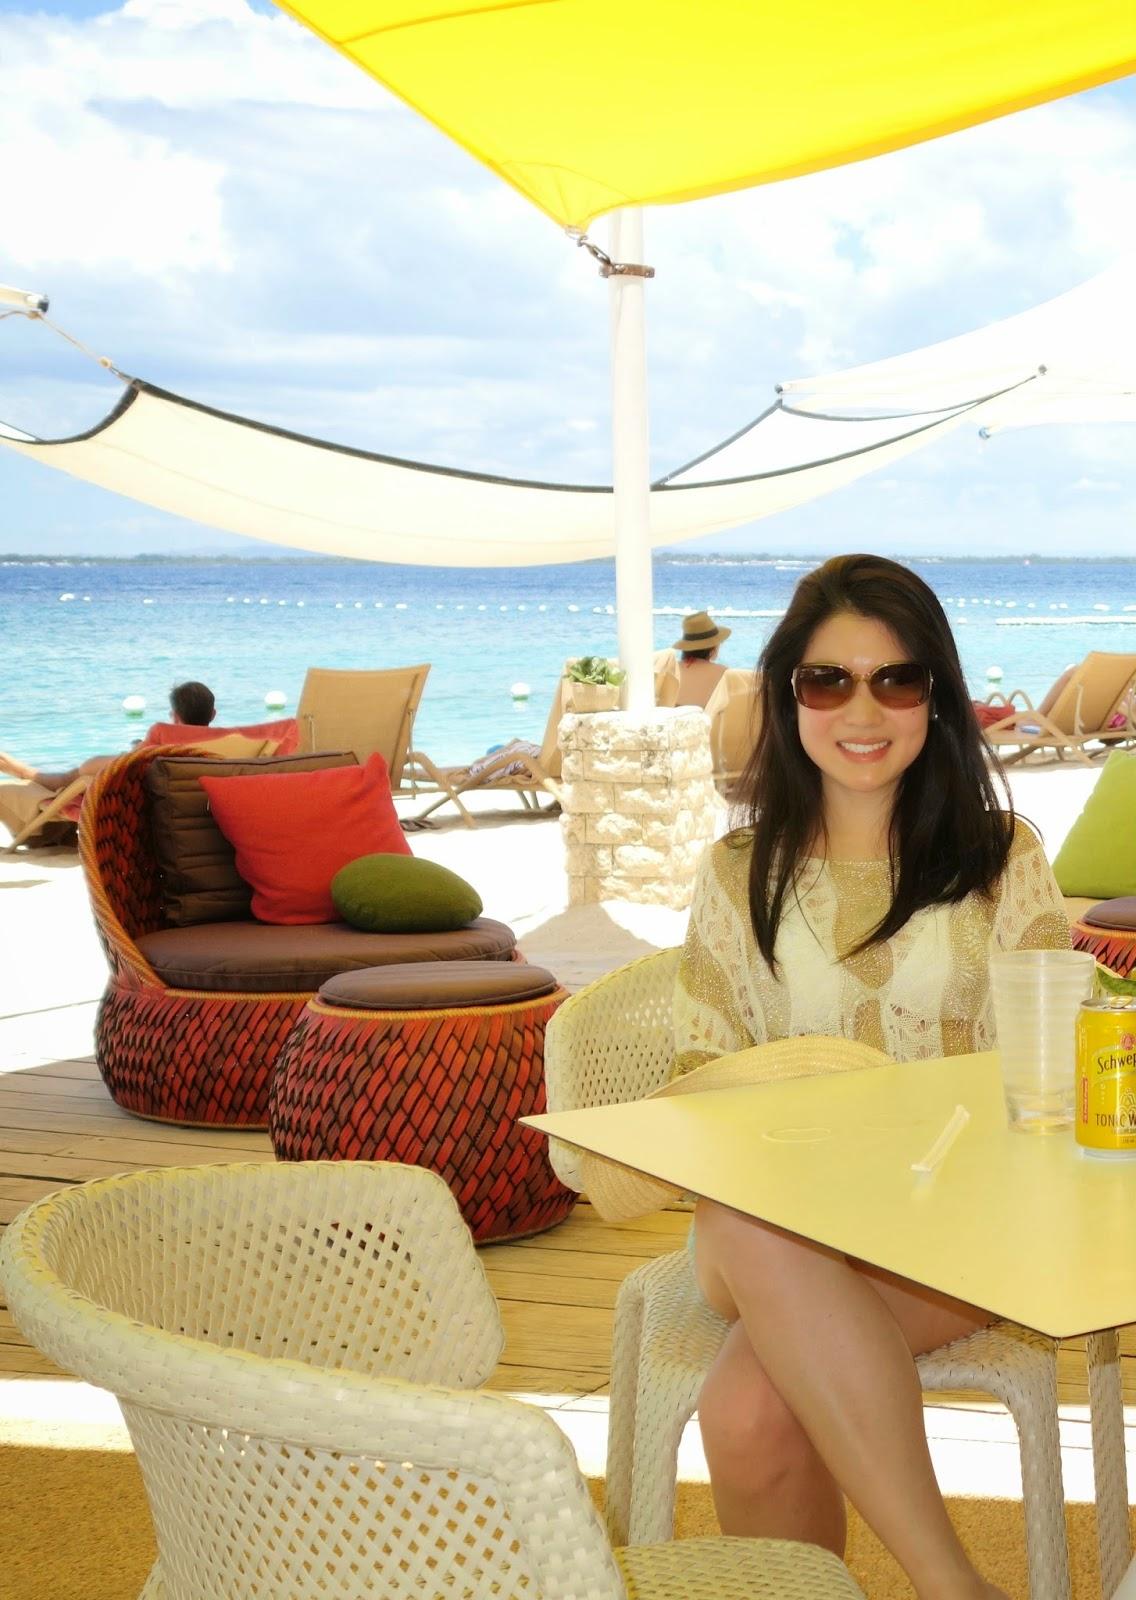 Shangrila Mactan Resort & Spa, Cebu, Philippines